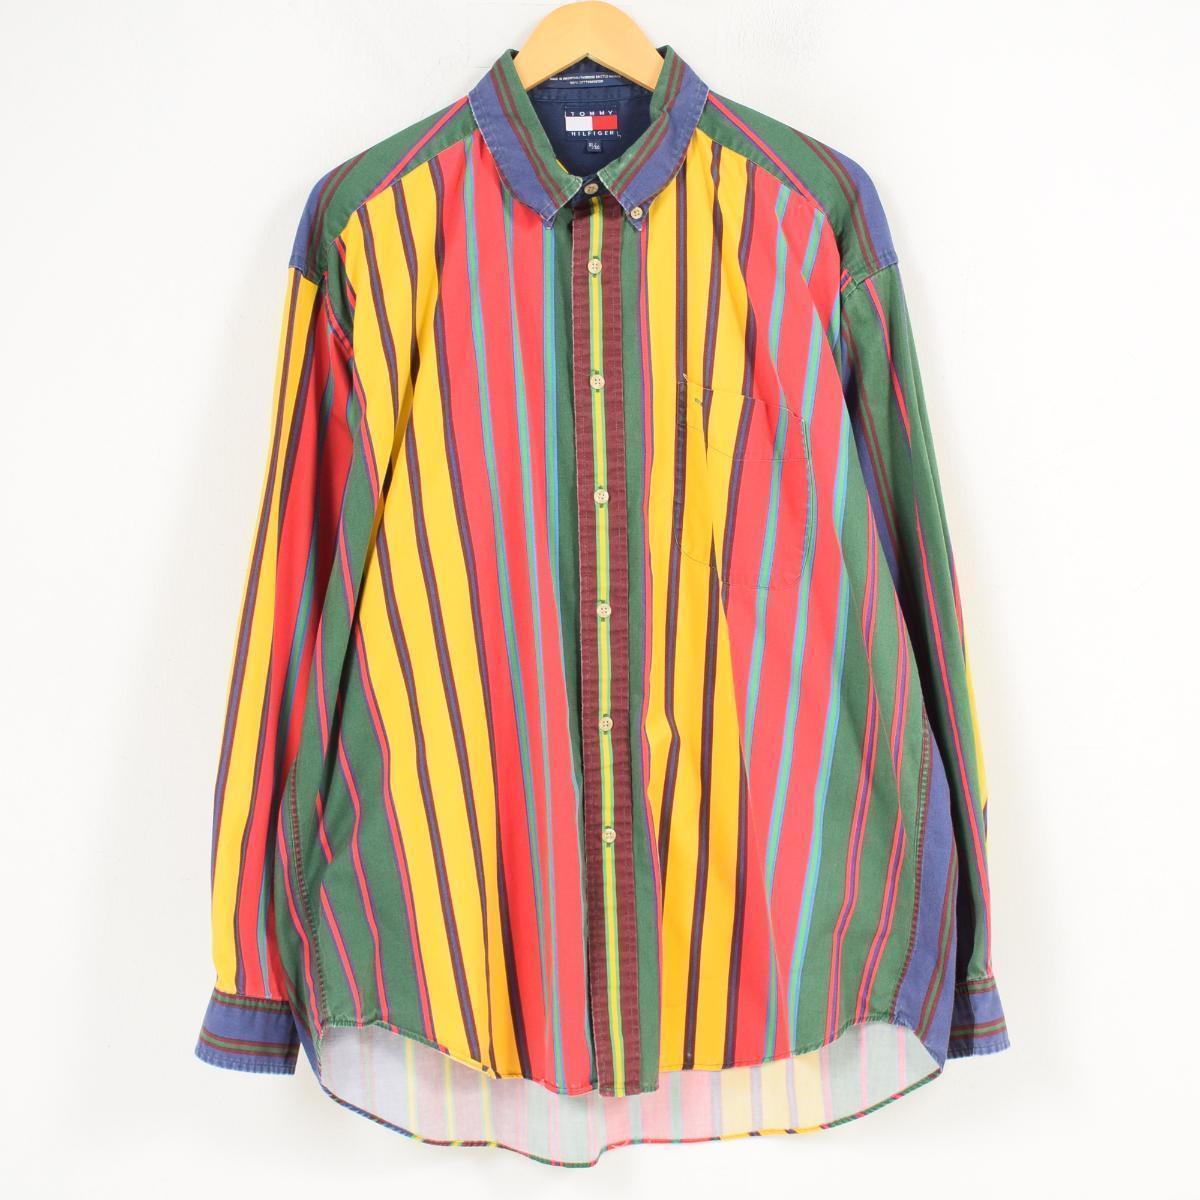 1258054648 90s トミーヒルフィガー TOMMY HILFIGER multi-stripe long sleeves stripe shirt men XL  /wat8460 ...